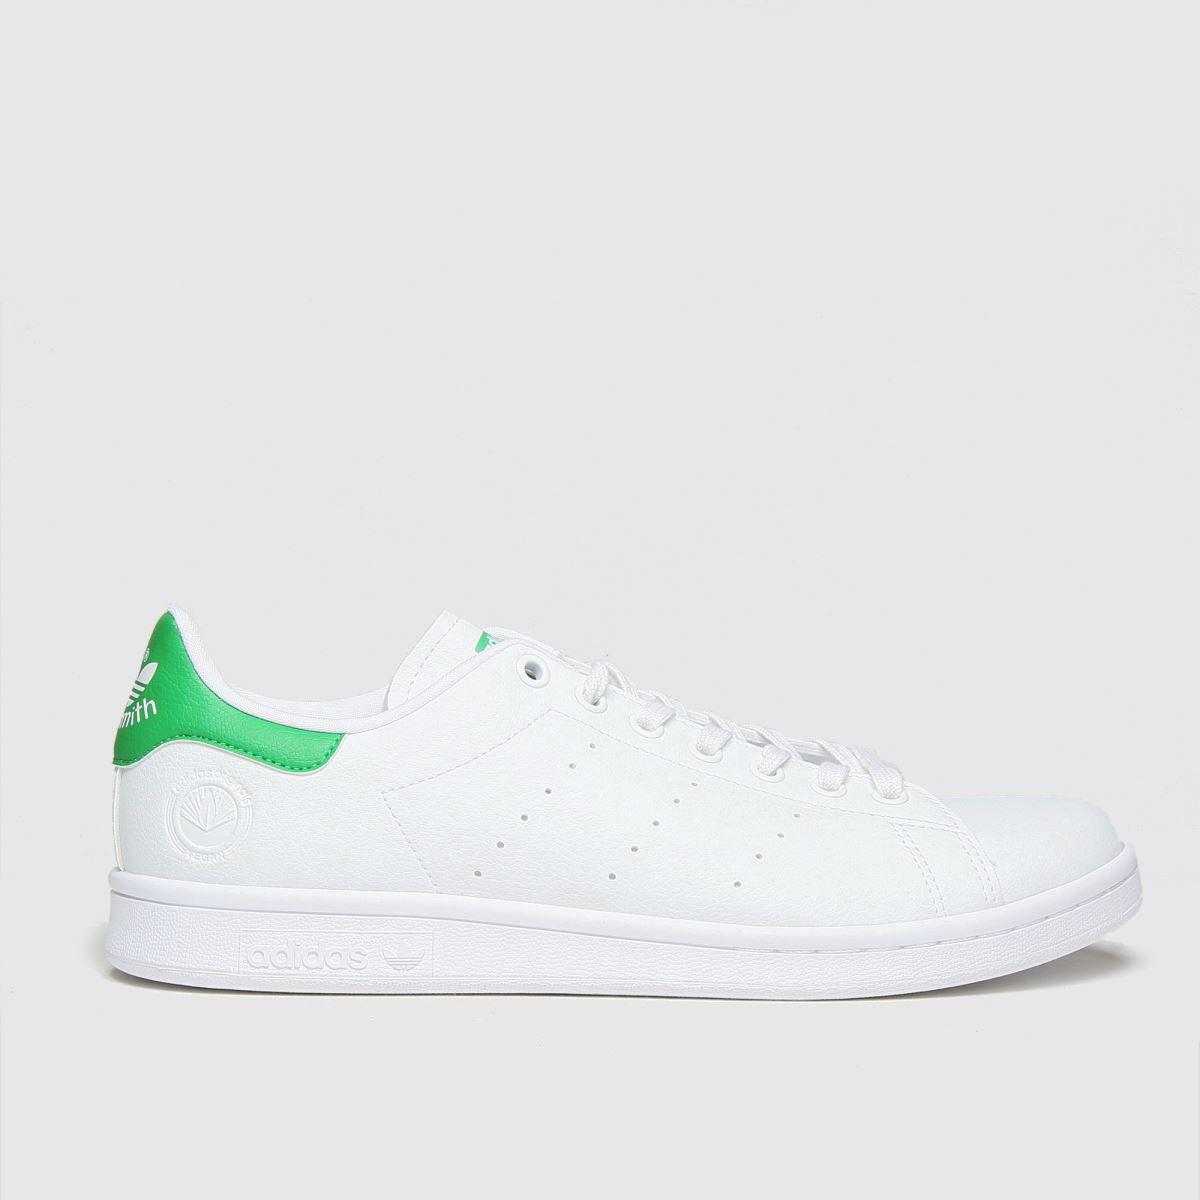 Adidas White & Green Stan Smith Vegan Trainers